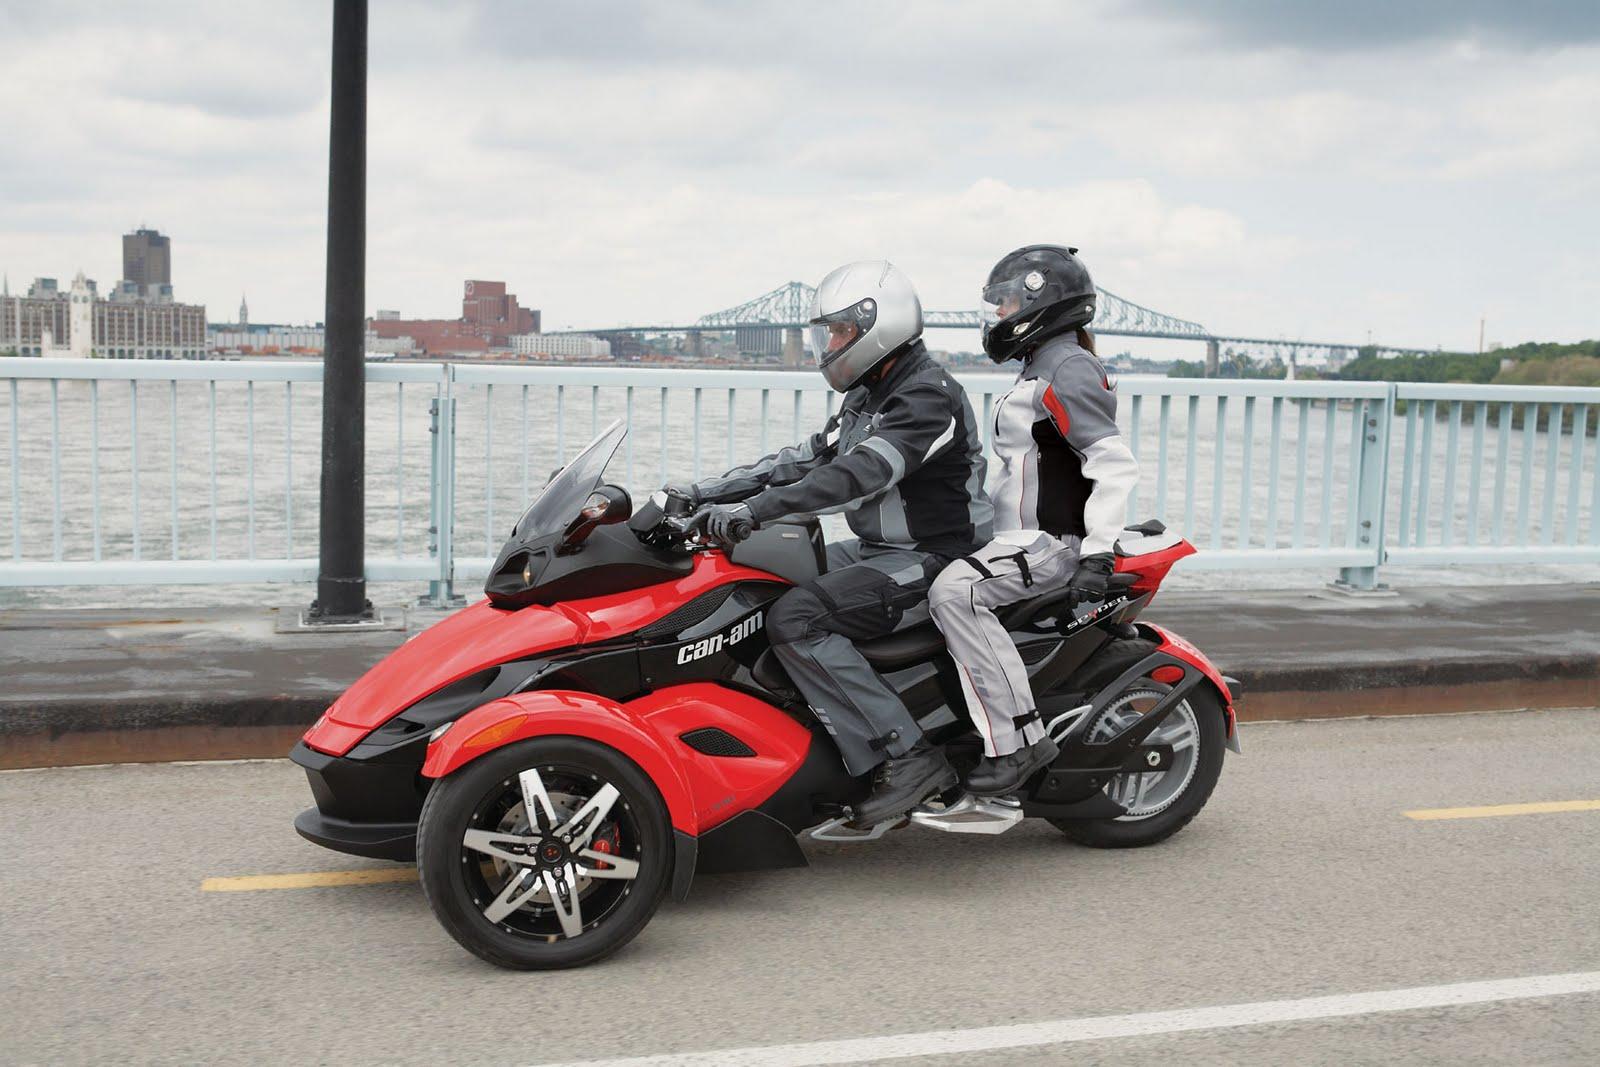 http://3.bp.blogspot.com/-o6wGrcDl9WY/TaAuwrgFJDI/AAAAAAAAASU/O3M2QktDR7E/s1600/Can-Am+Spyder+Roadster+SM5+2009+%2528Sequential+Manual+five-speed%2529+photo.jpg